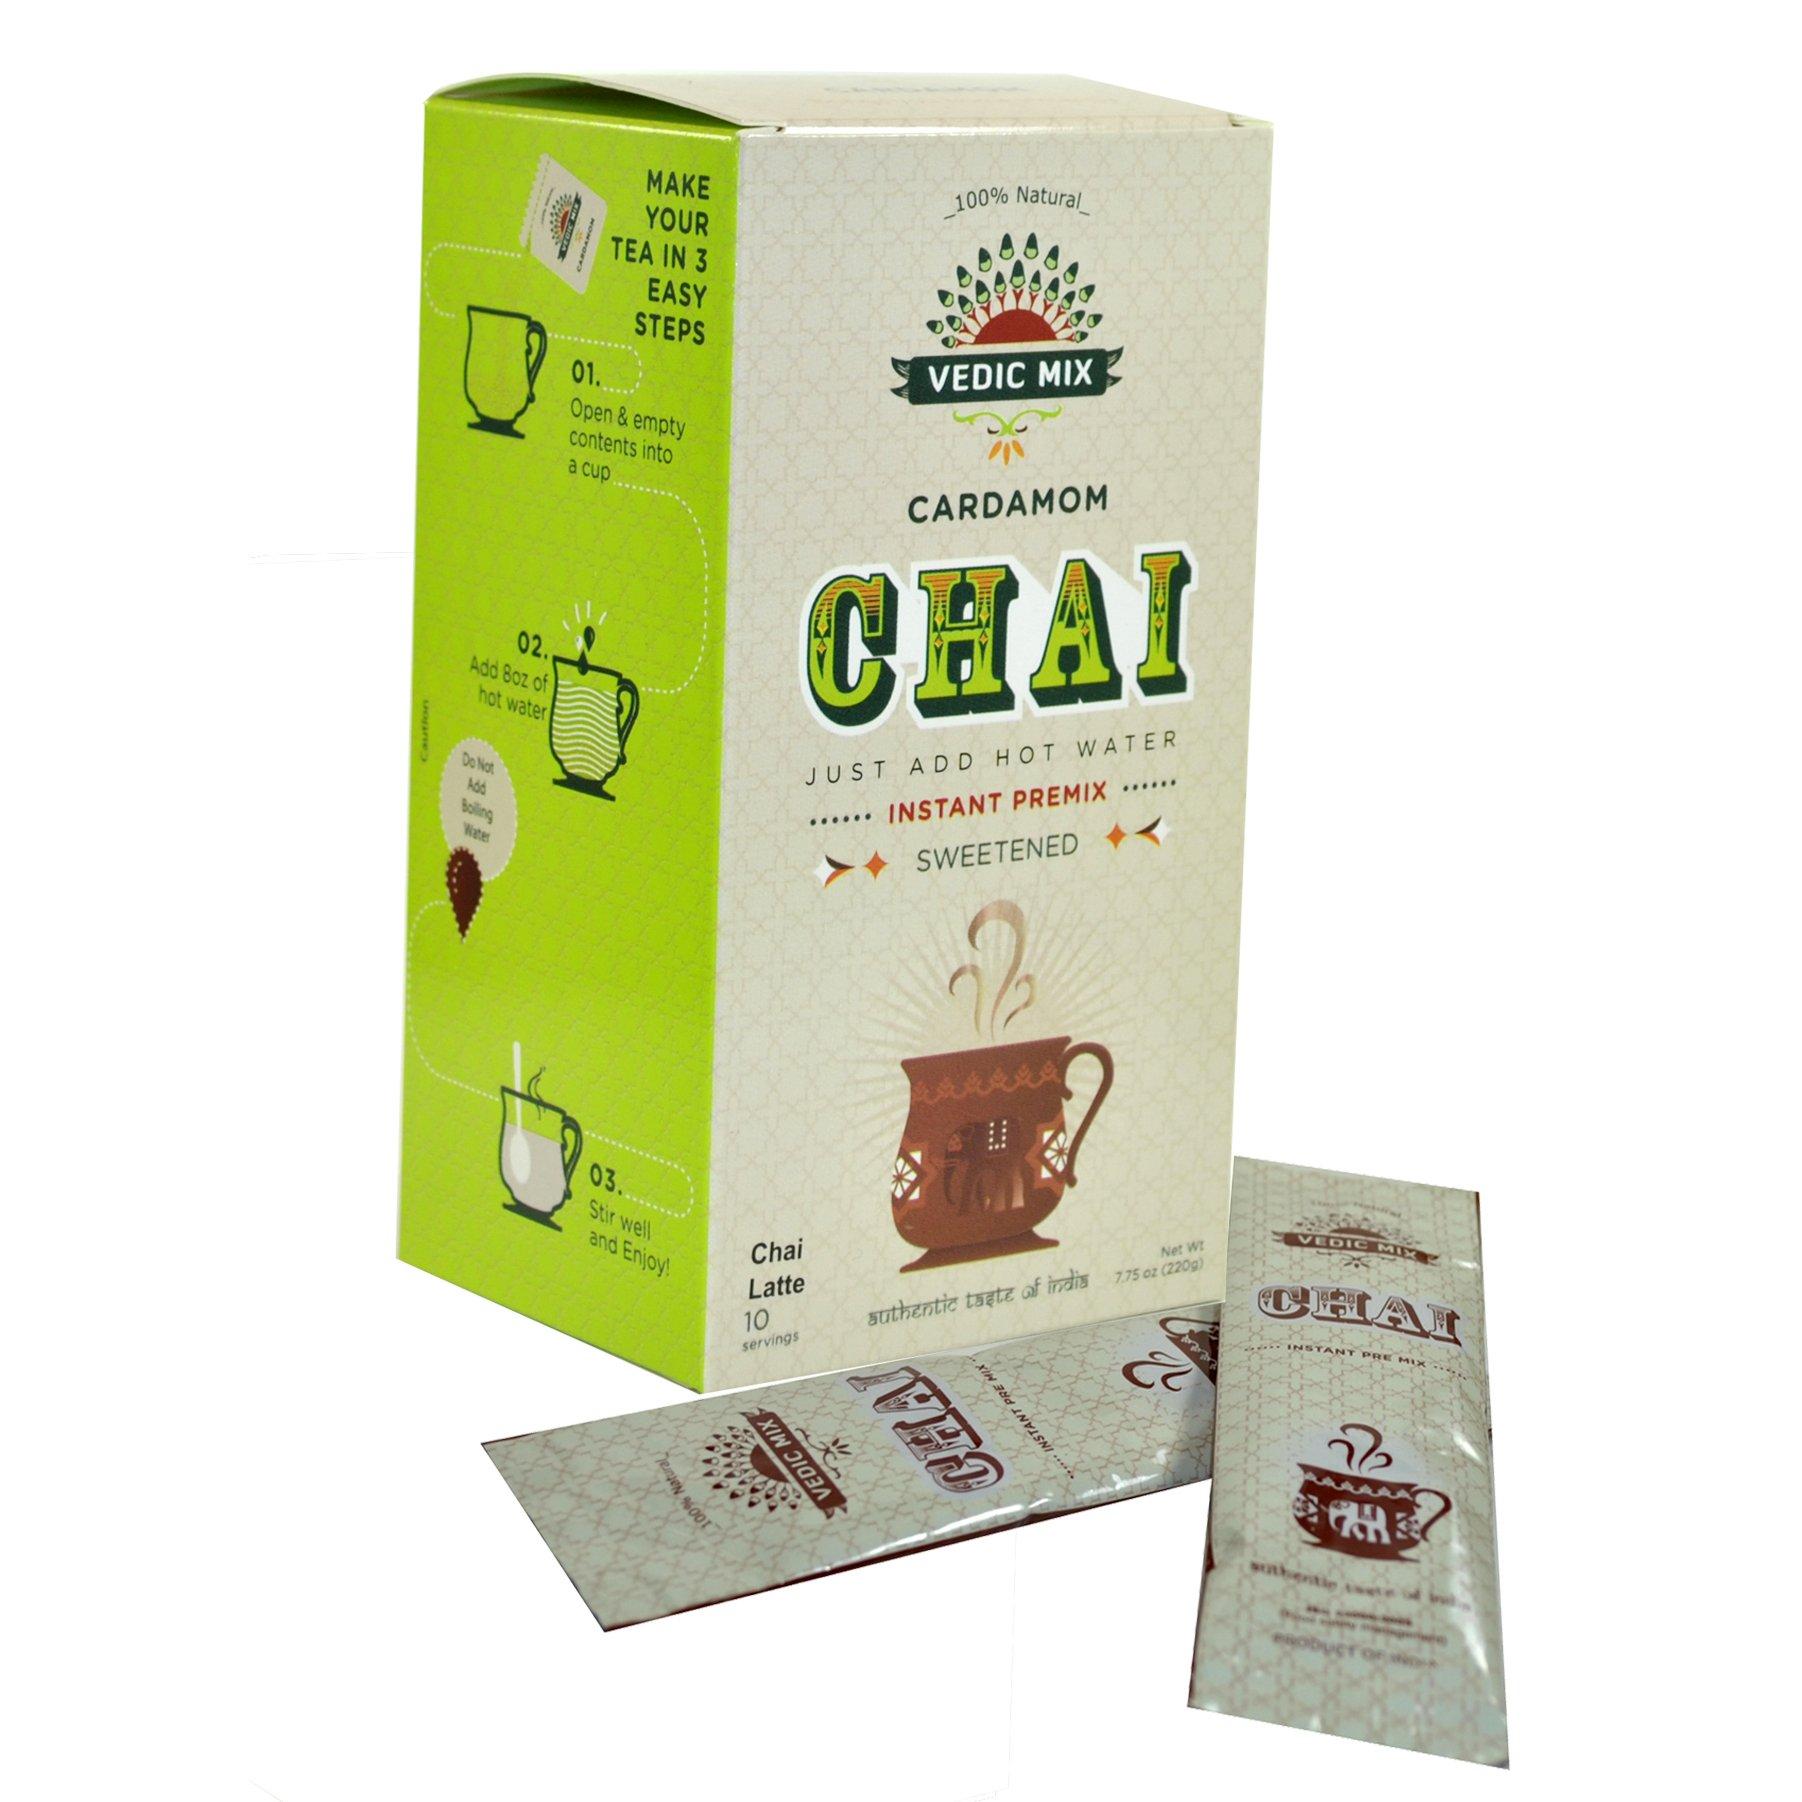 Vedic Mix Chai Tea Latte Mix Sweetened (Cardamom Chai, 6 Pack)